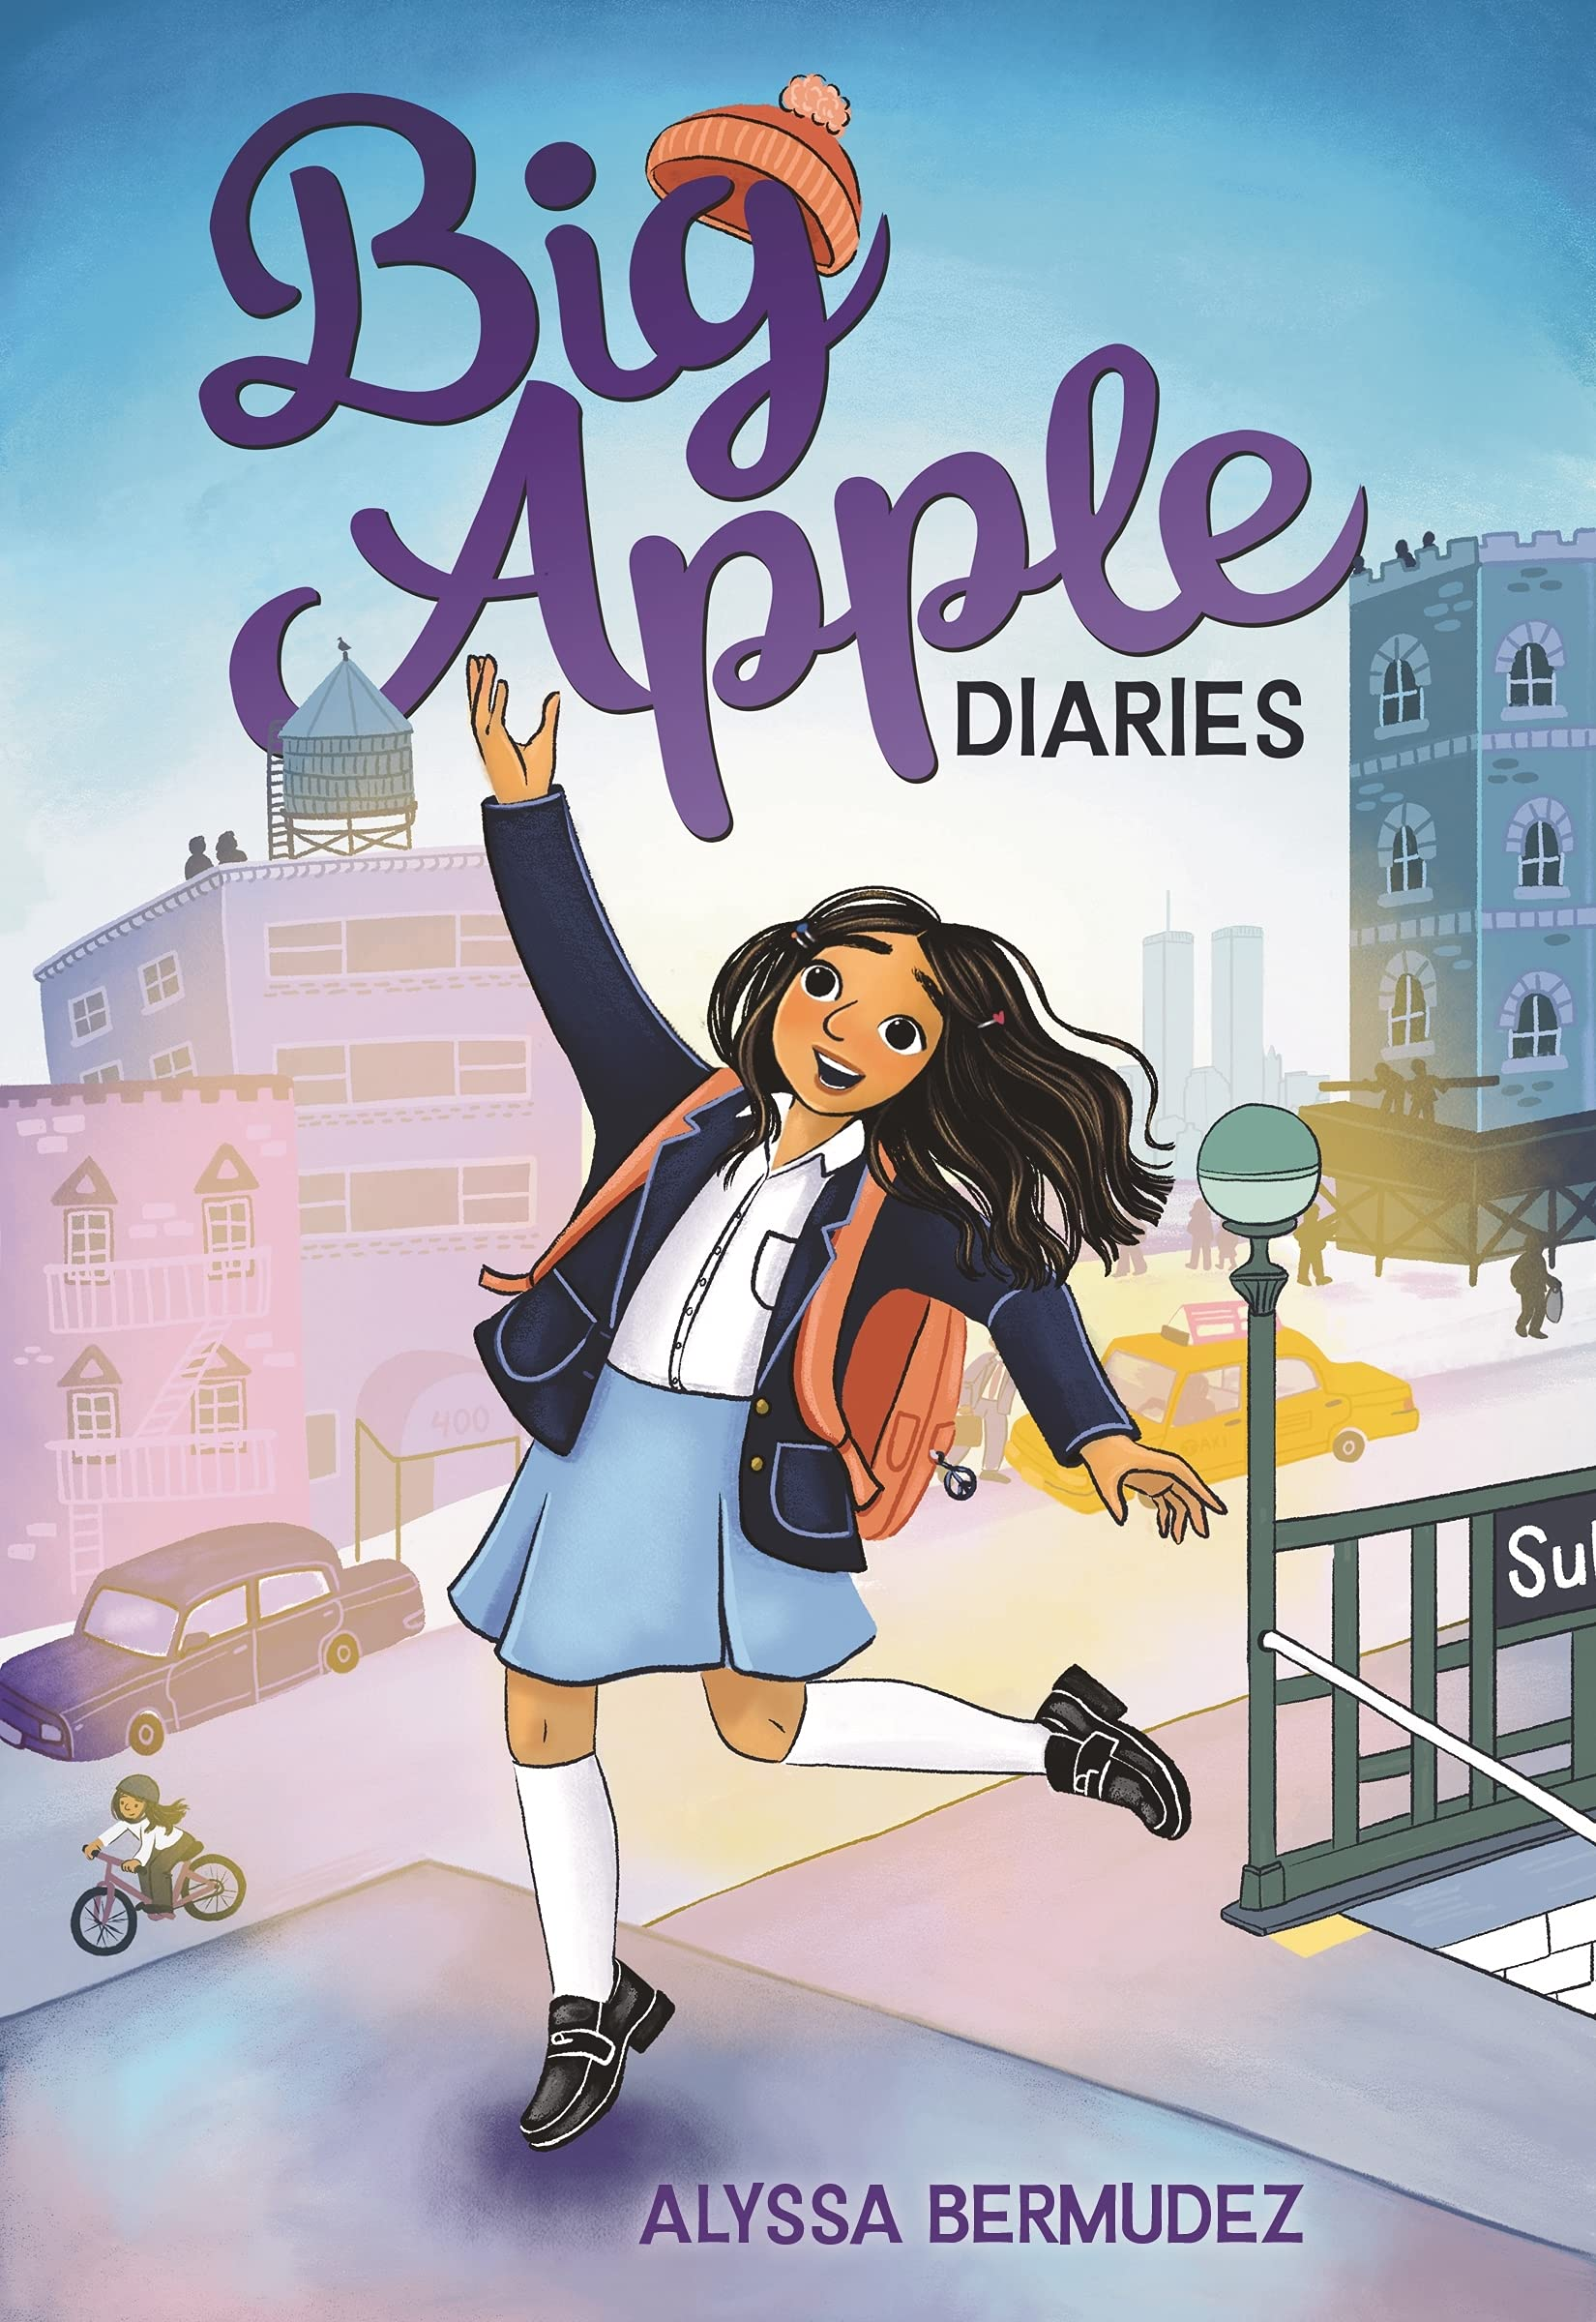 Amazon.com: Big Apple Diaries: 9781250774279: Bermudez, Alyssa, Bermudez,  Alyssa: Books